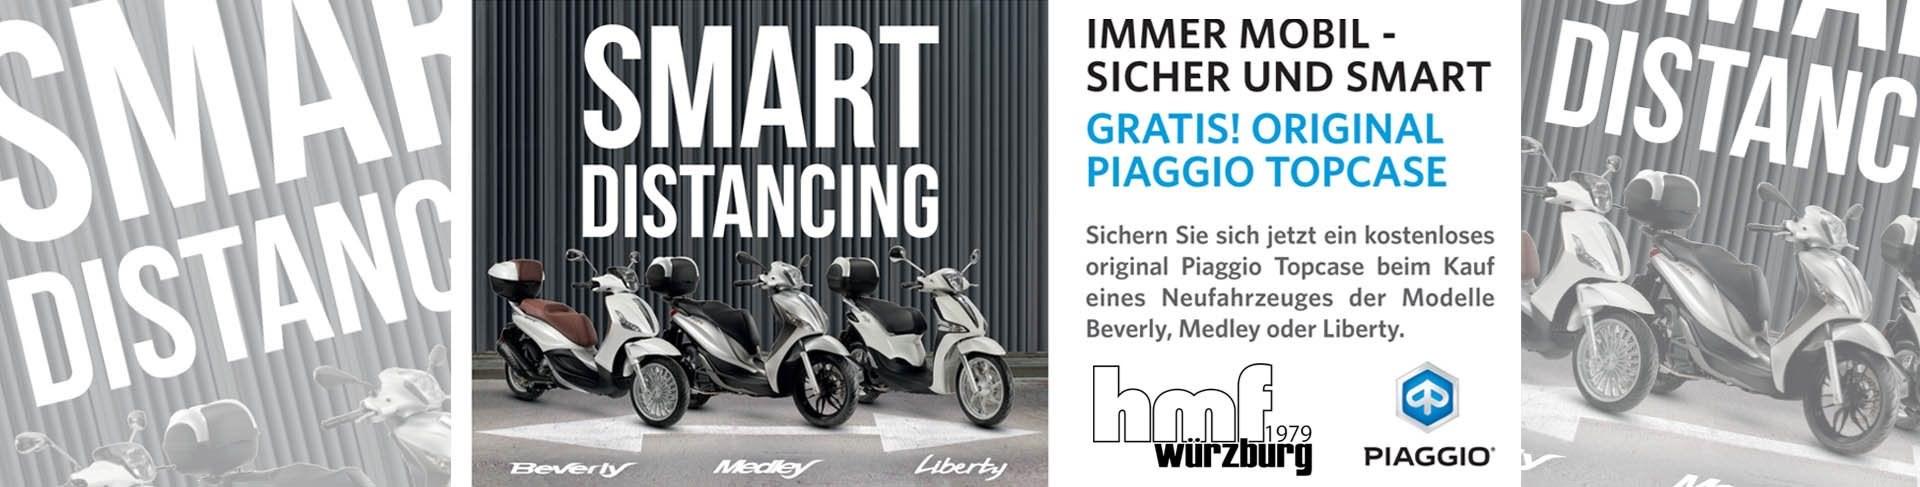 Piaggio High Wheel Promotion 2020